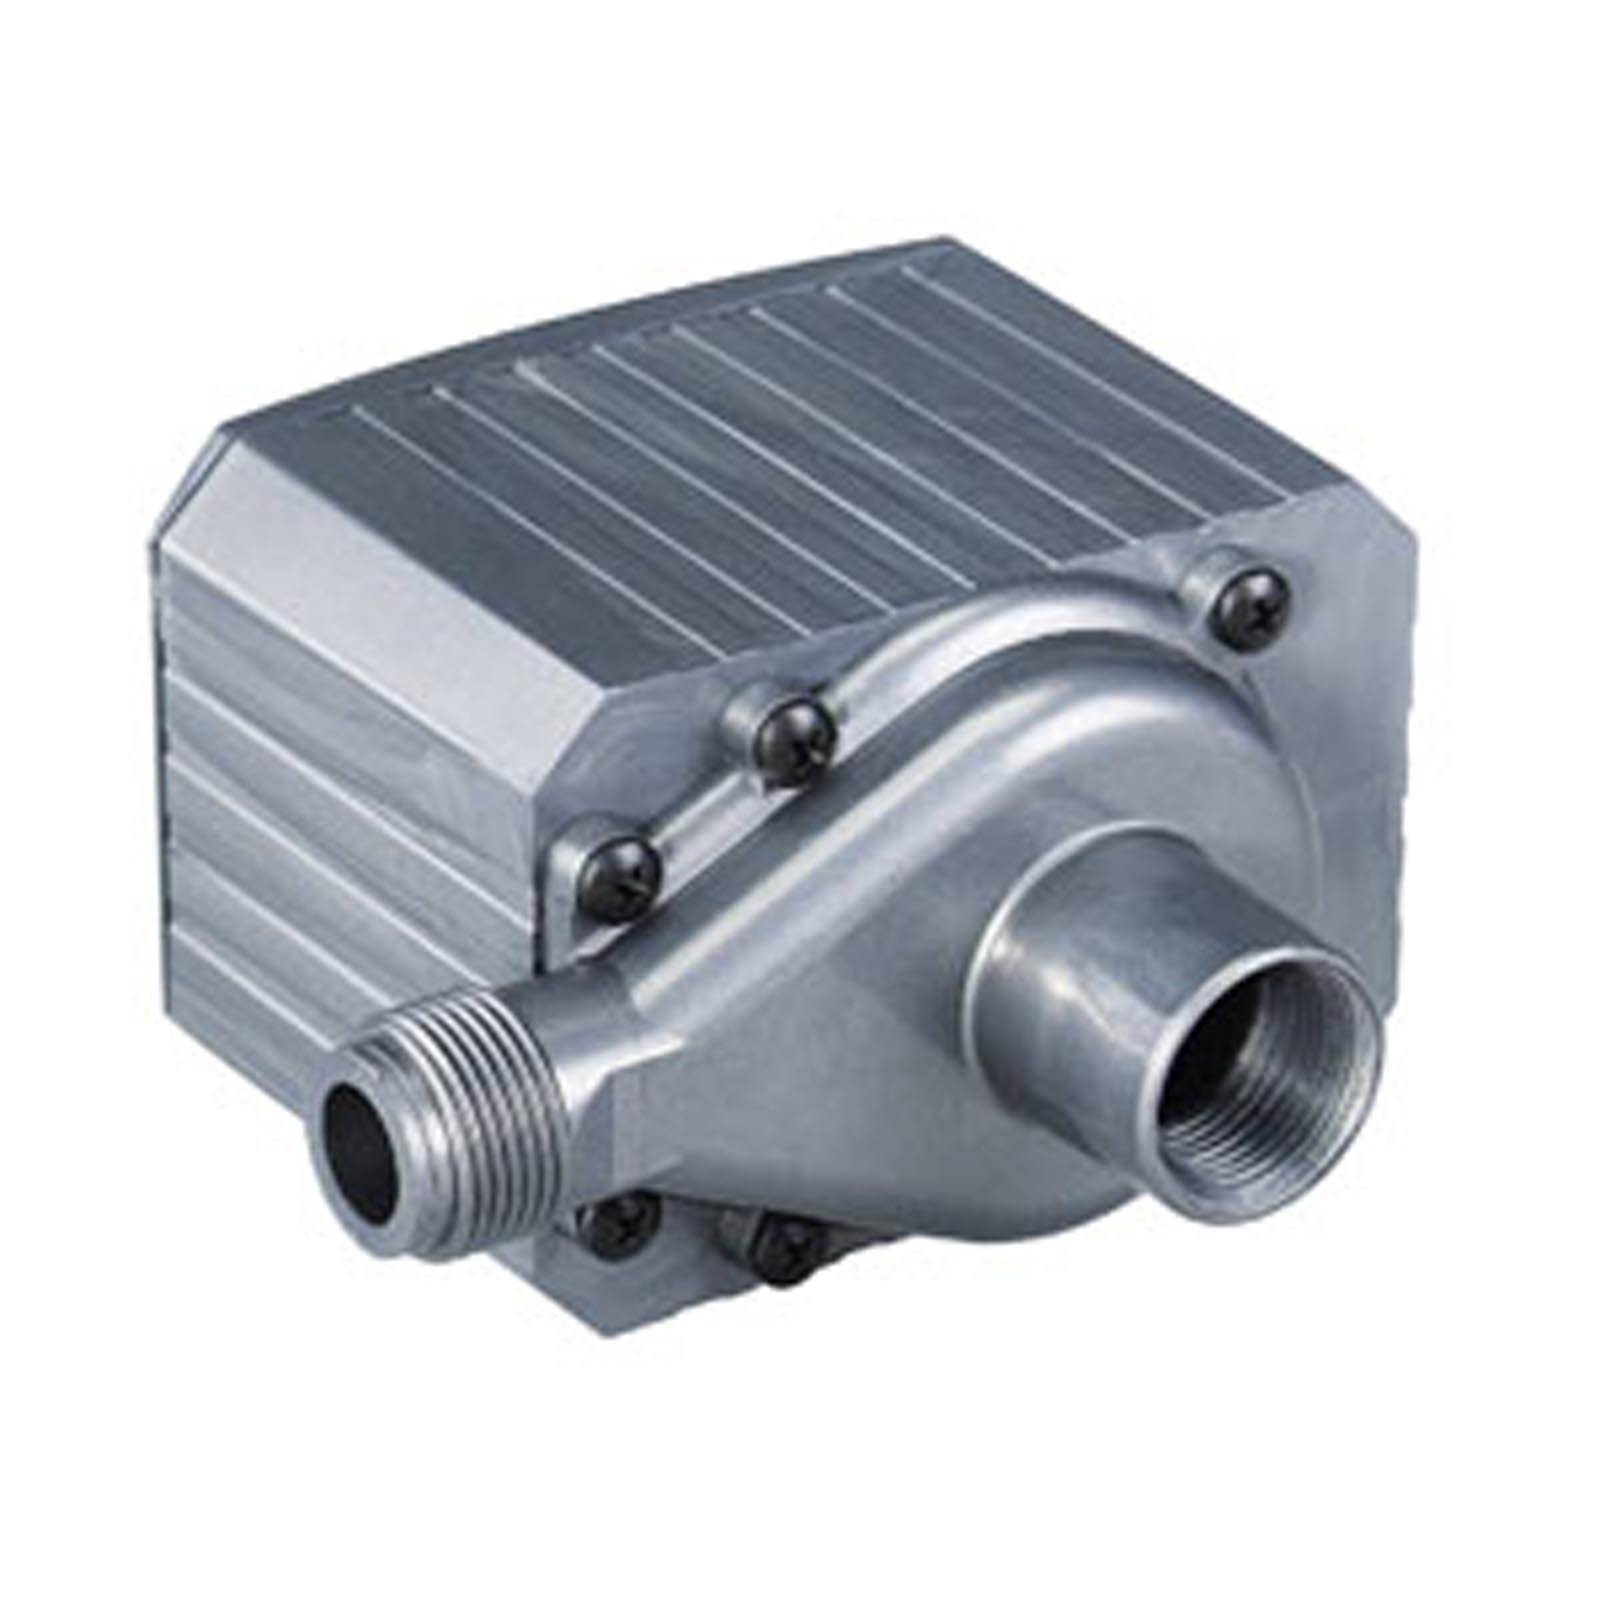 PONDMASTER Model 9.5 Supreme 950 GPH Magnetic Drive Fountain Pond Pump02710